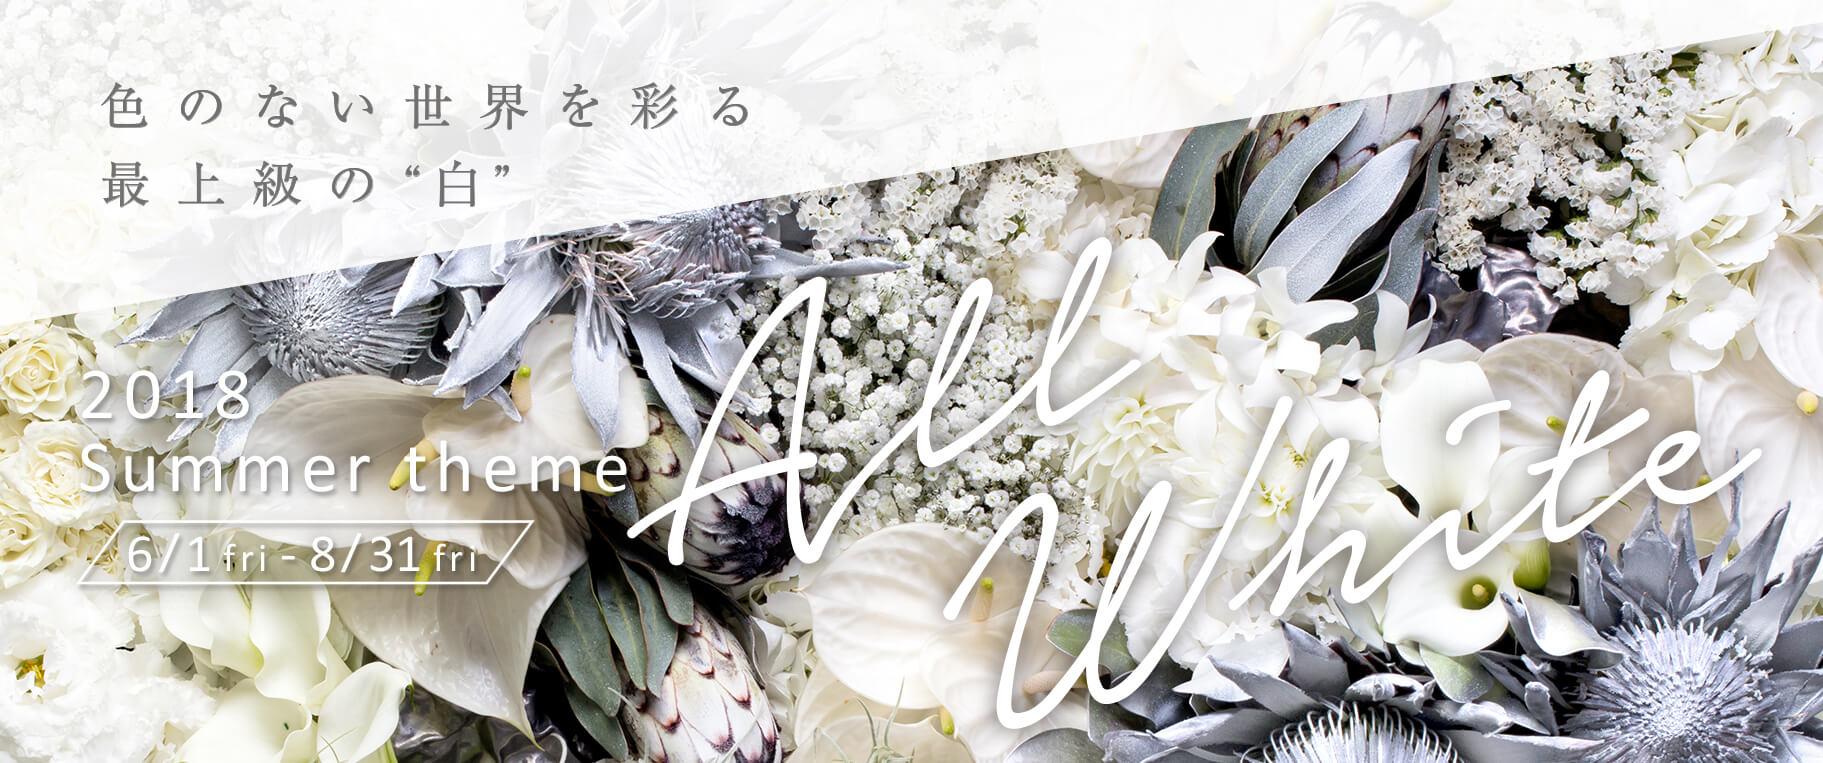 2018 Summer theme「All White(オールホワイト)」